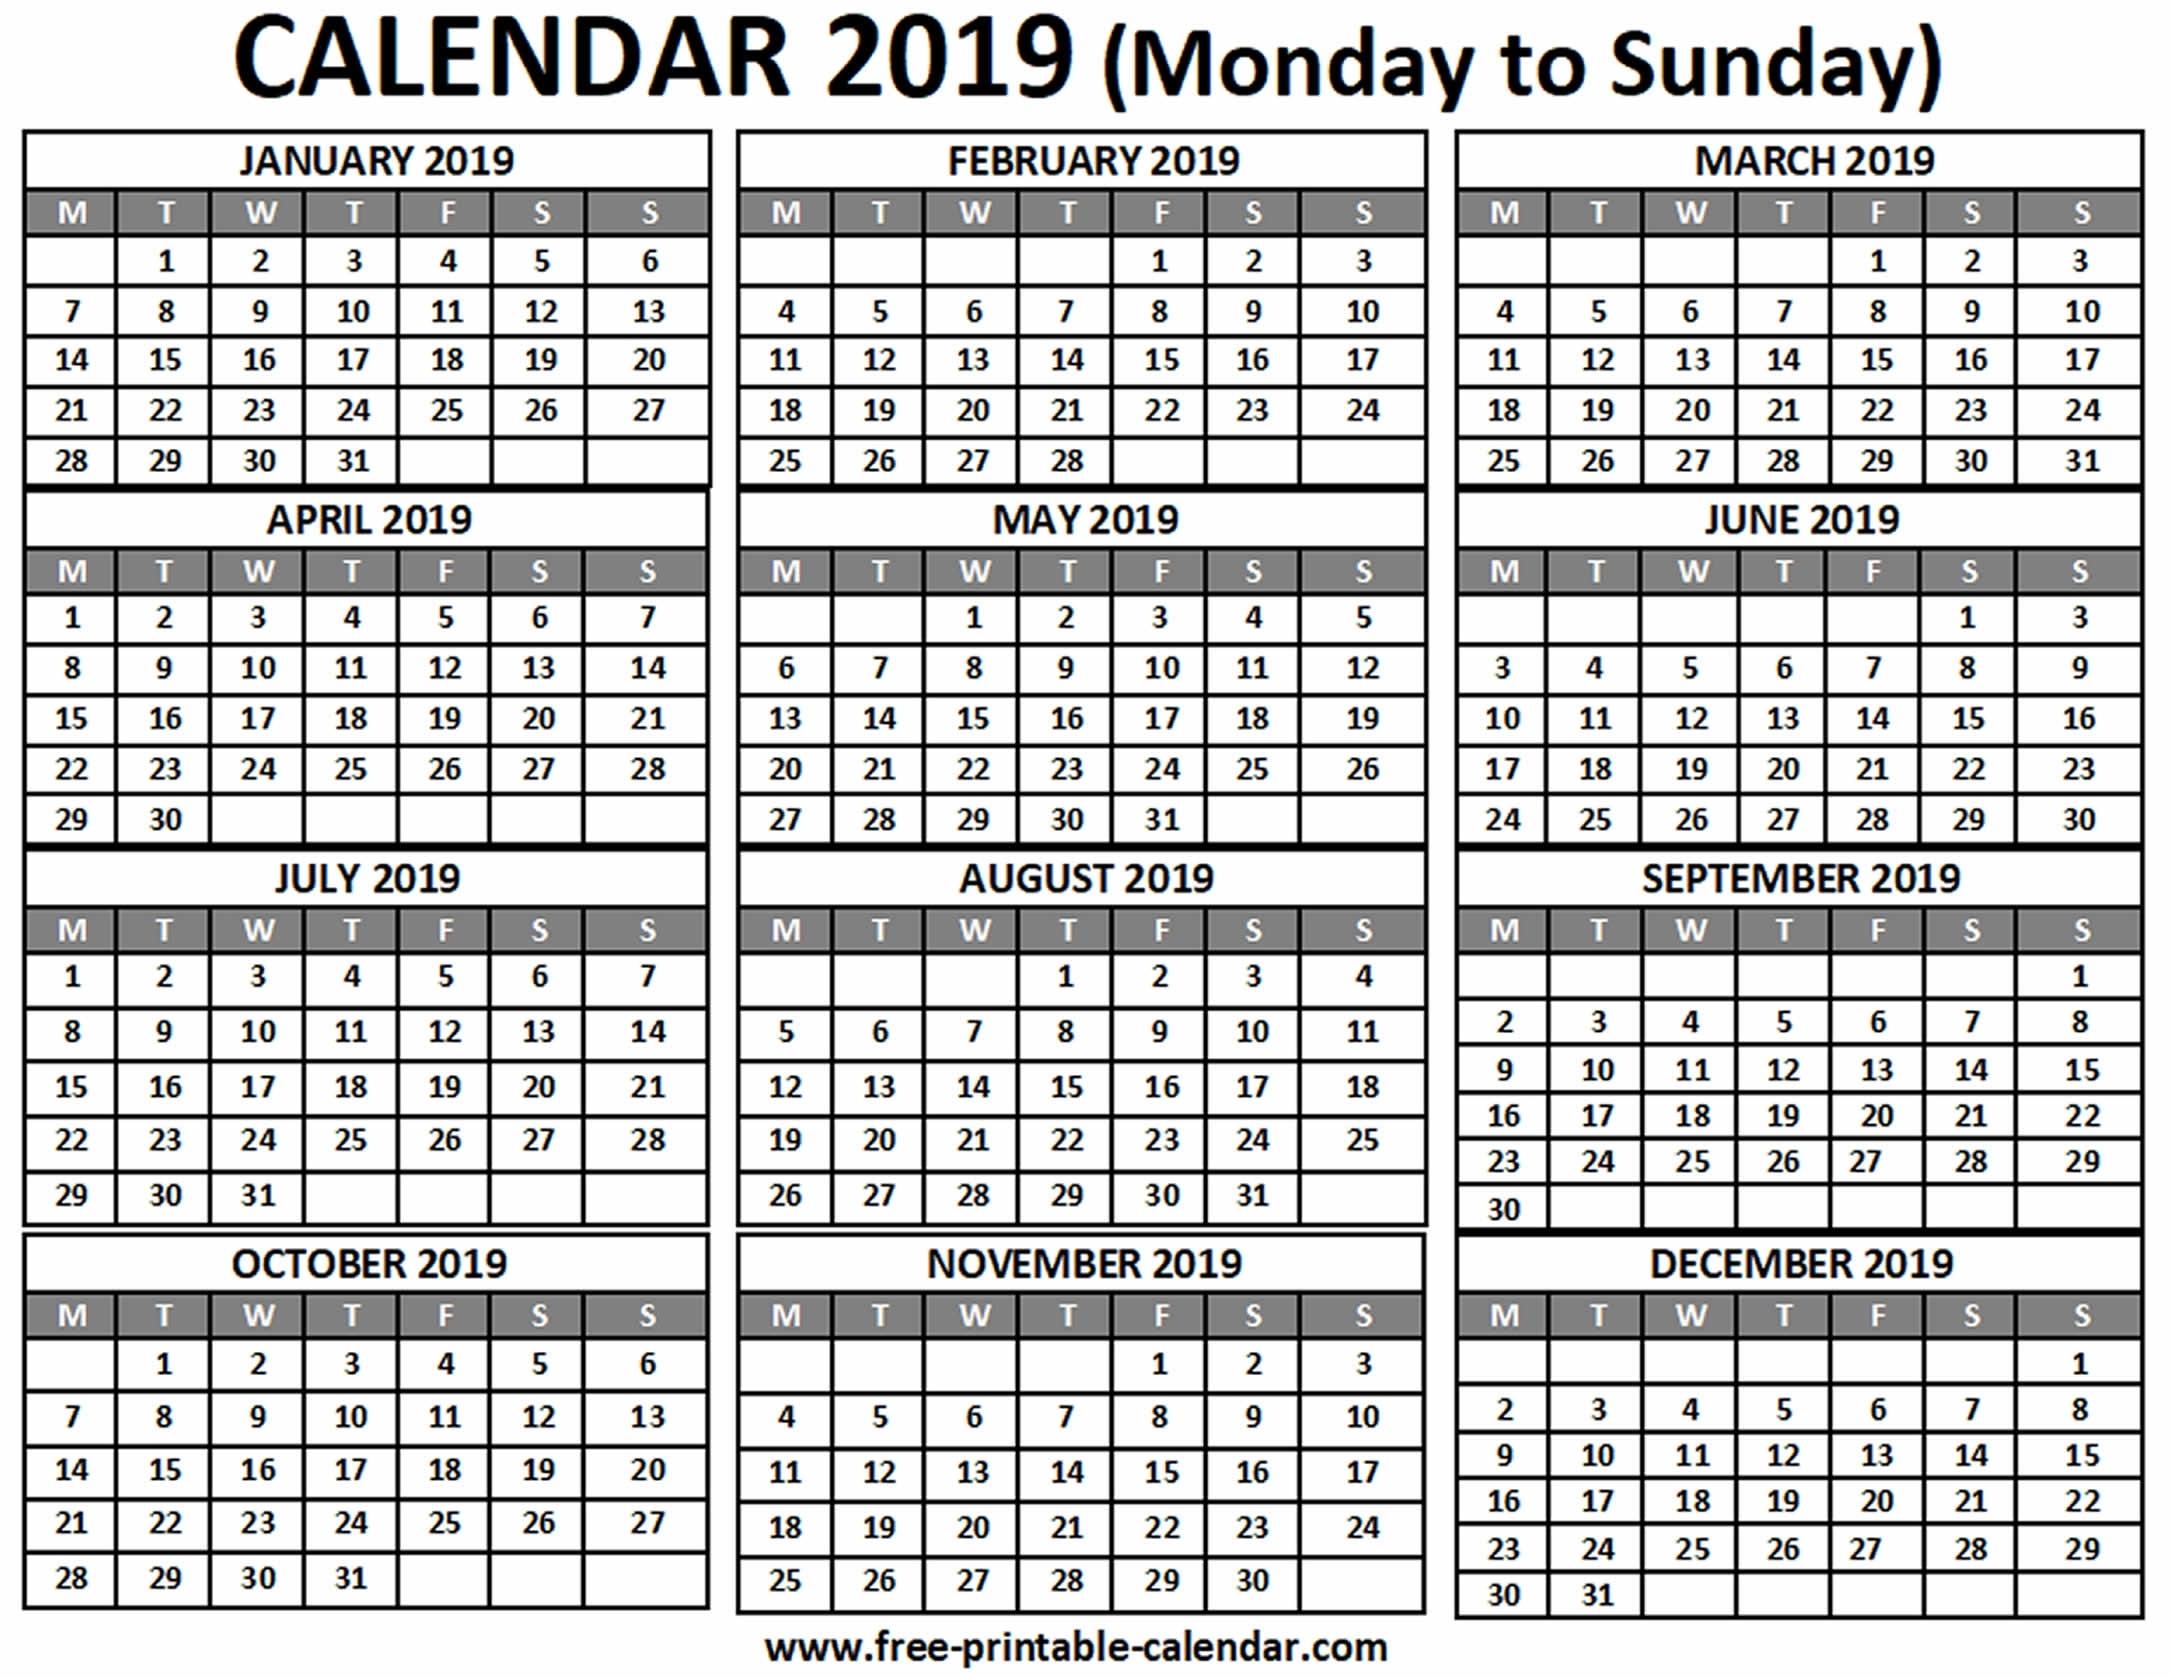 2019 Calendar - Free-Printable-Calendar